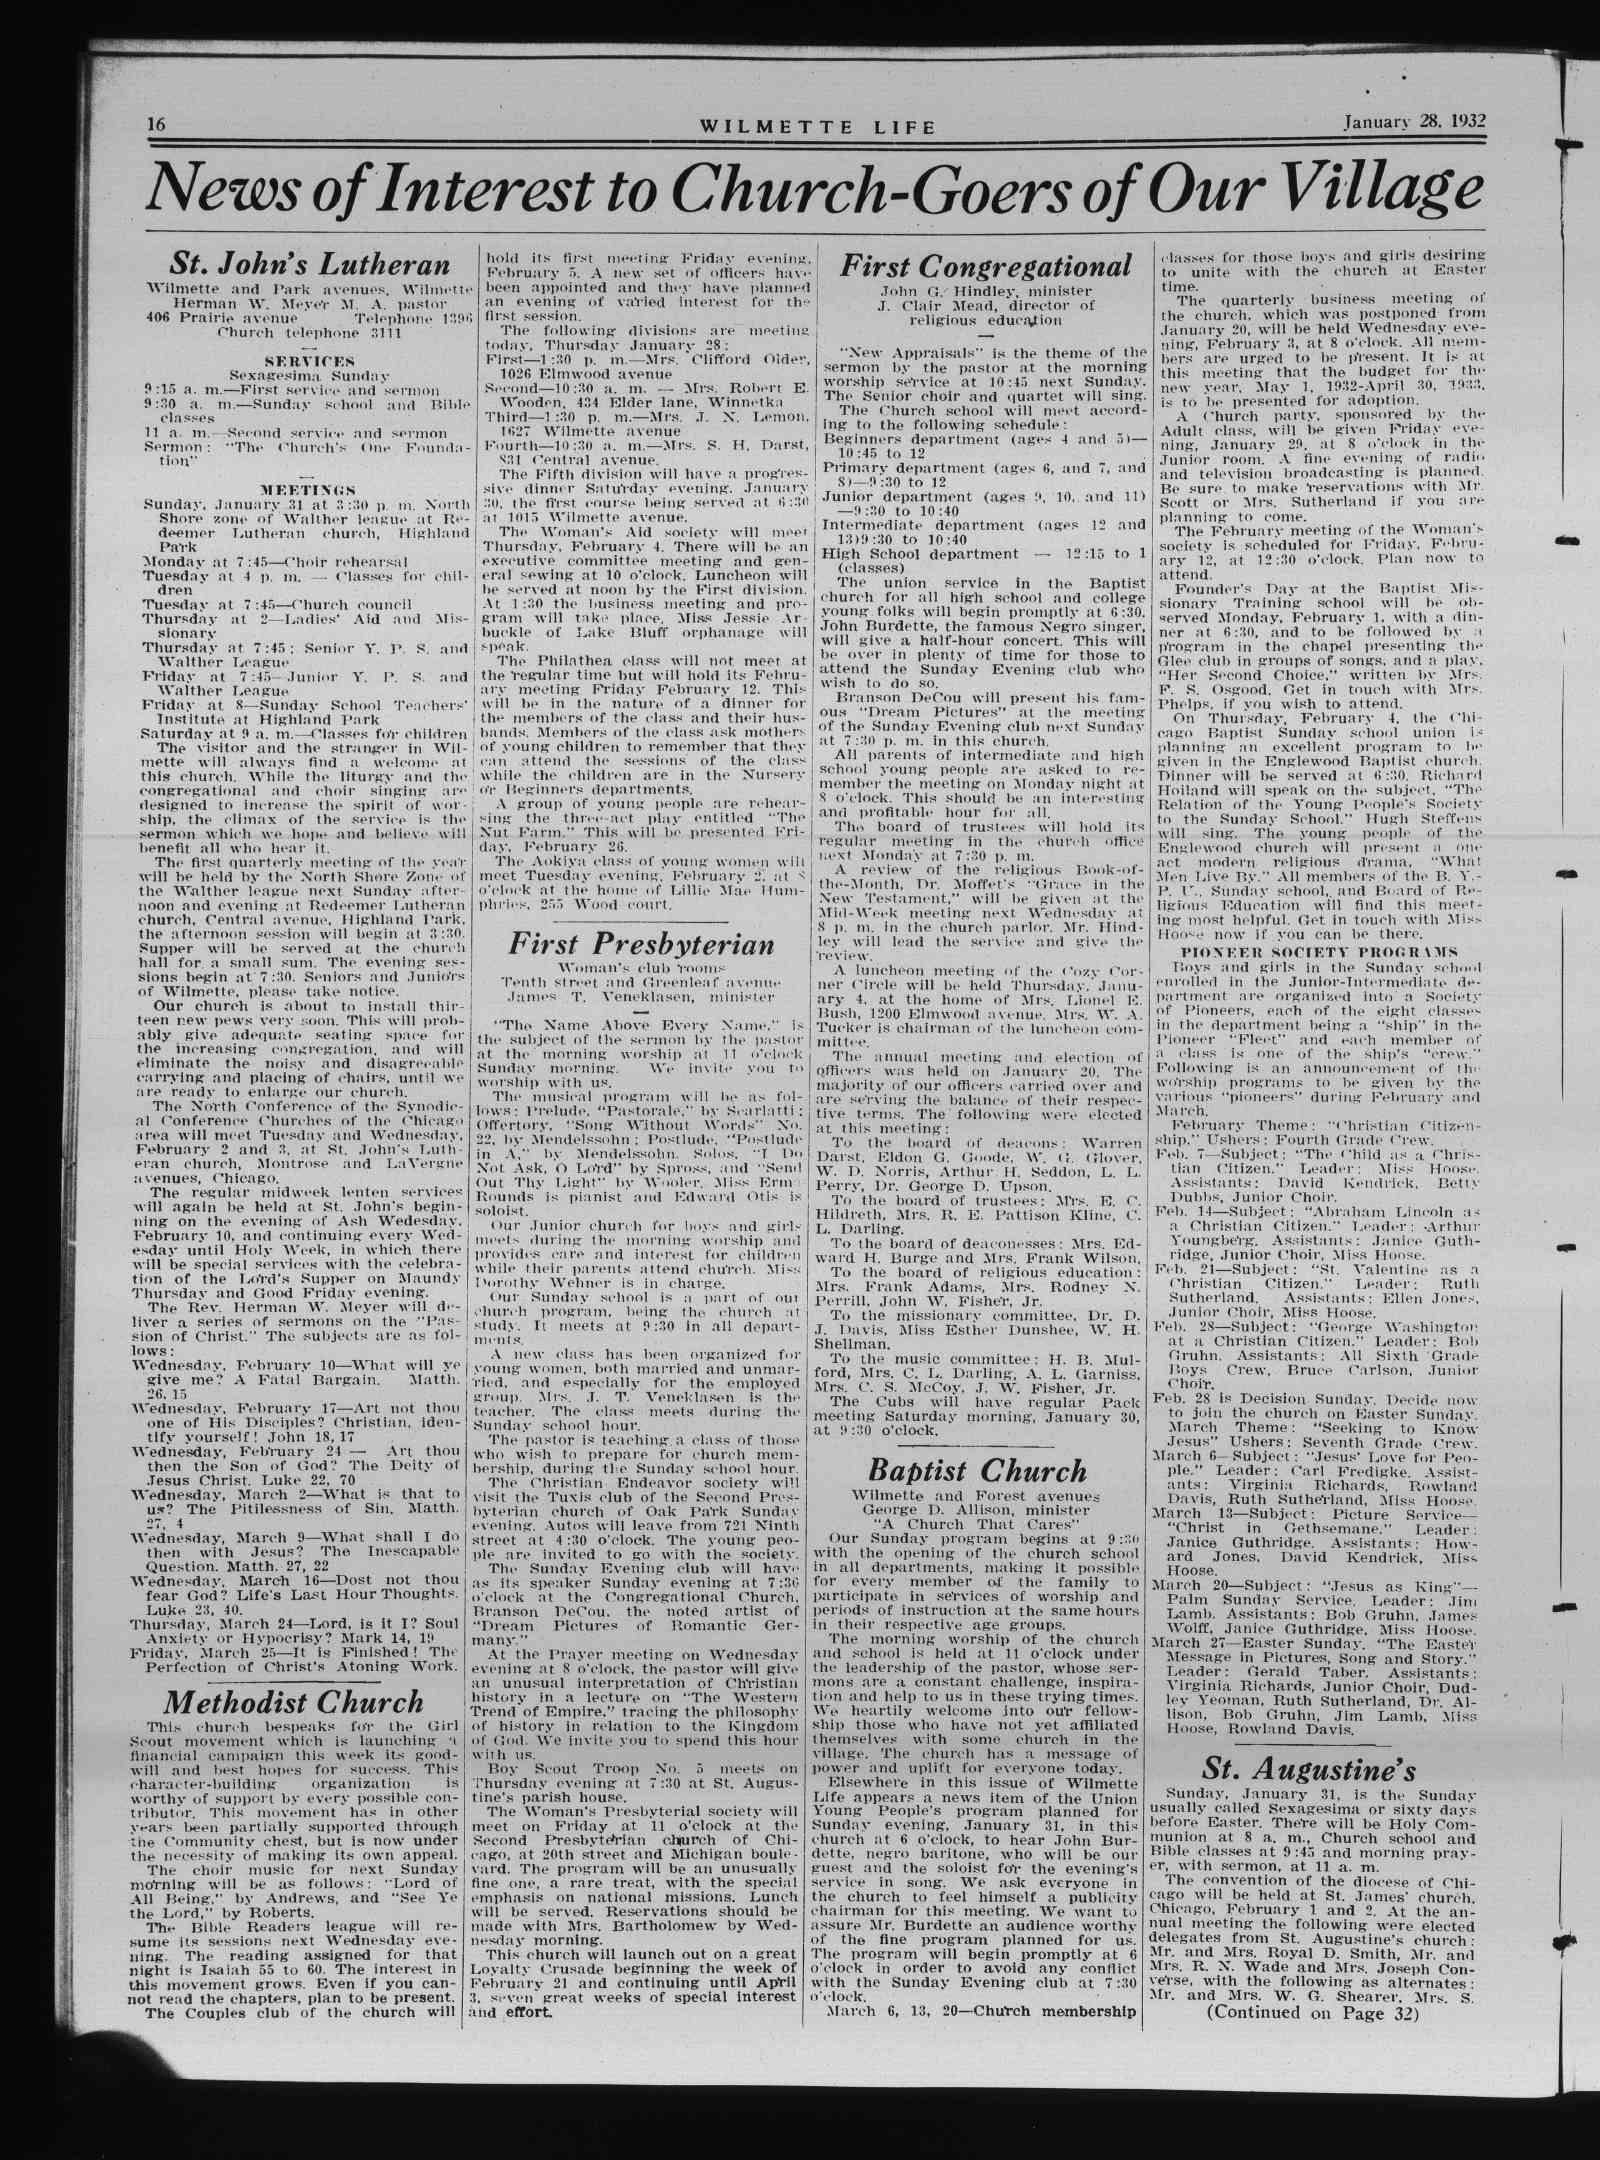 Wilmette Life (Wilmette, Illinois), 28 Jan 1932